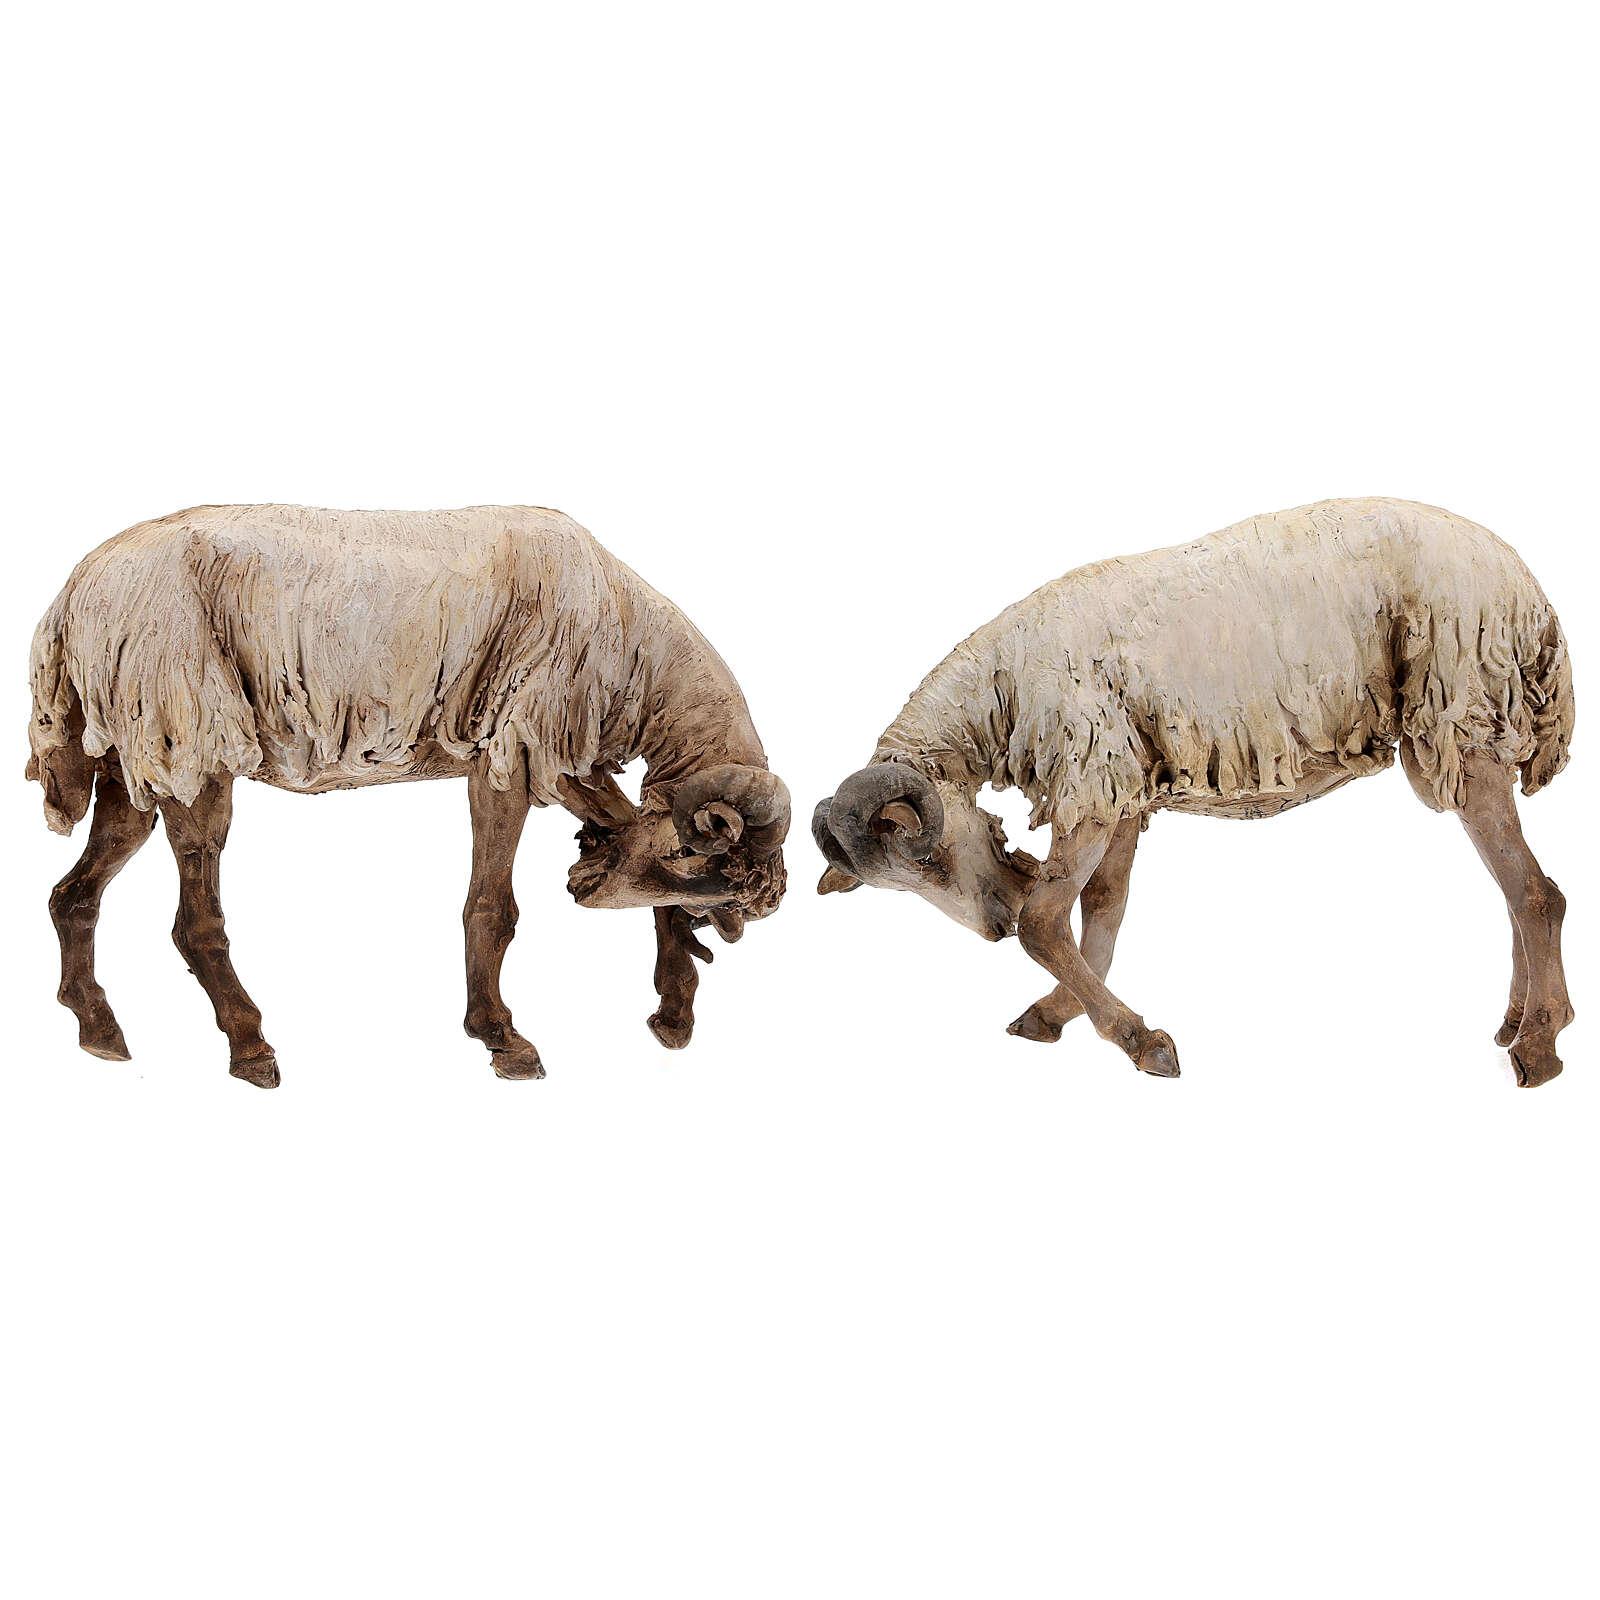 Scene goats fighting, 30 cm Tripi nativity 4